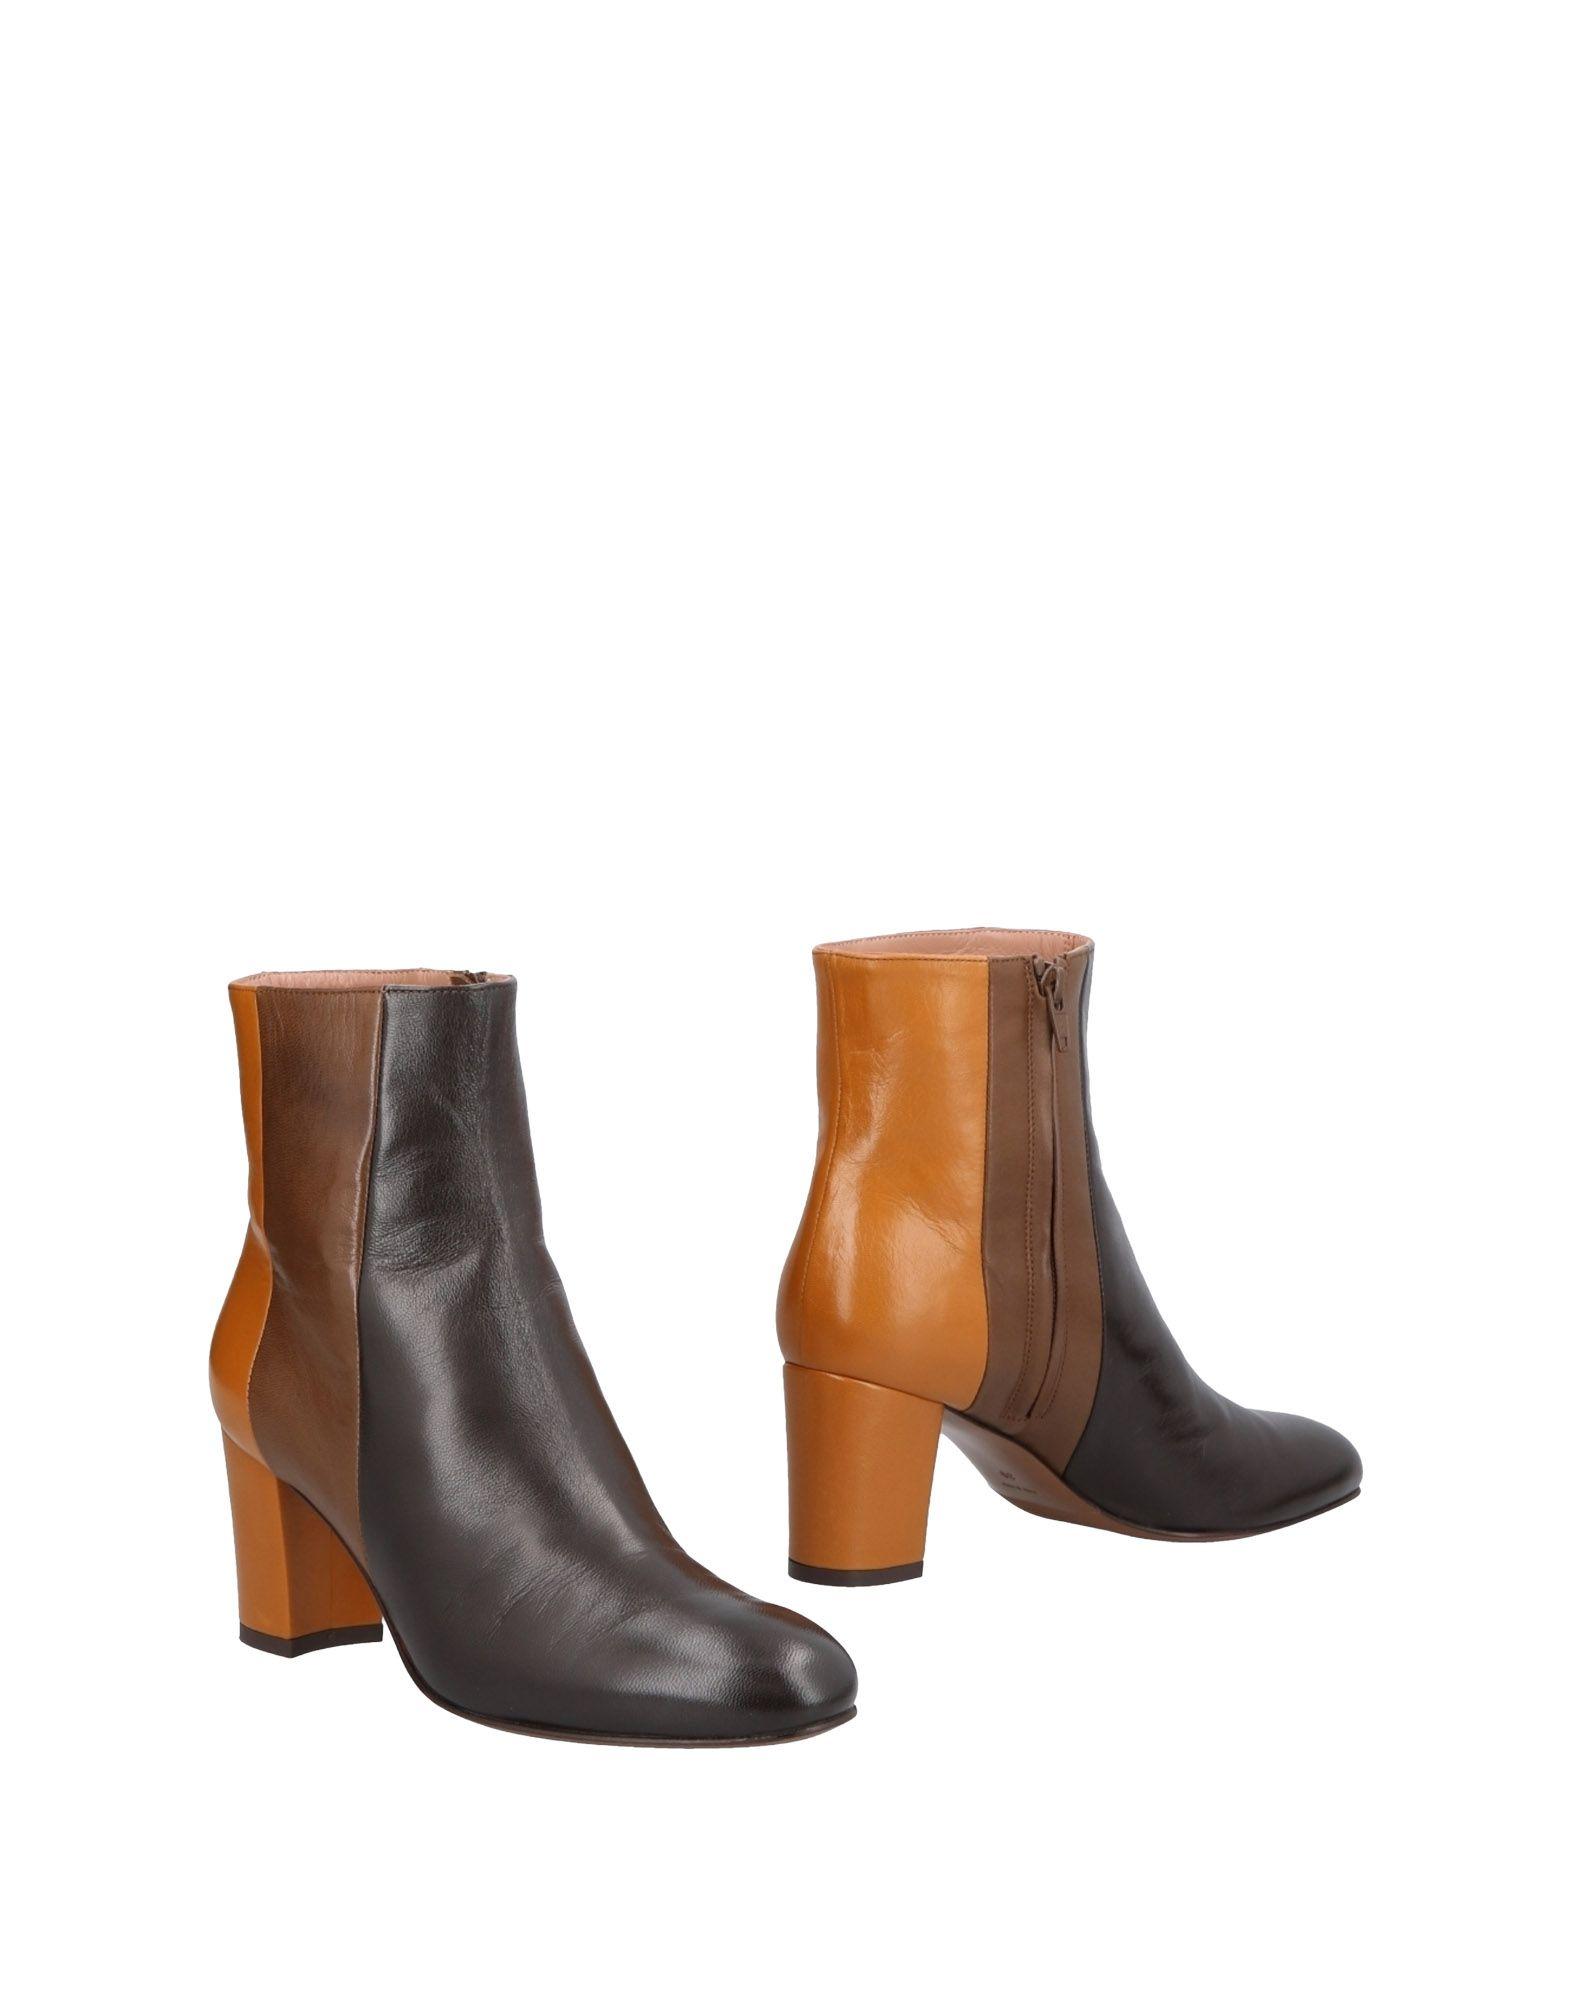 Rabatt Stiefelette Schuhe L' Autre Chose Stiefelette Rabatt Damen  11487989JB f71d70